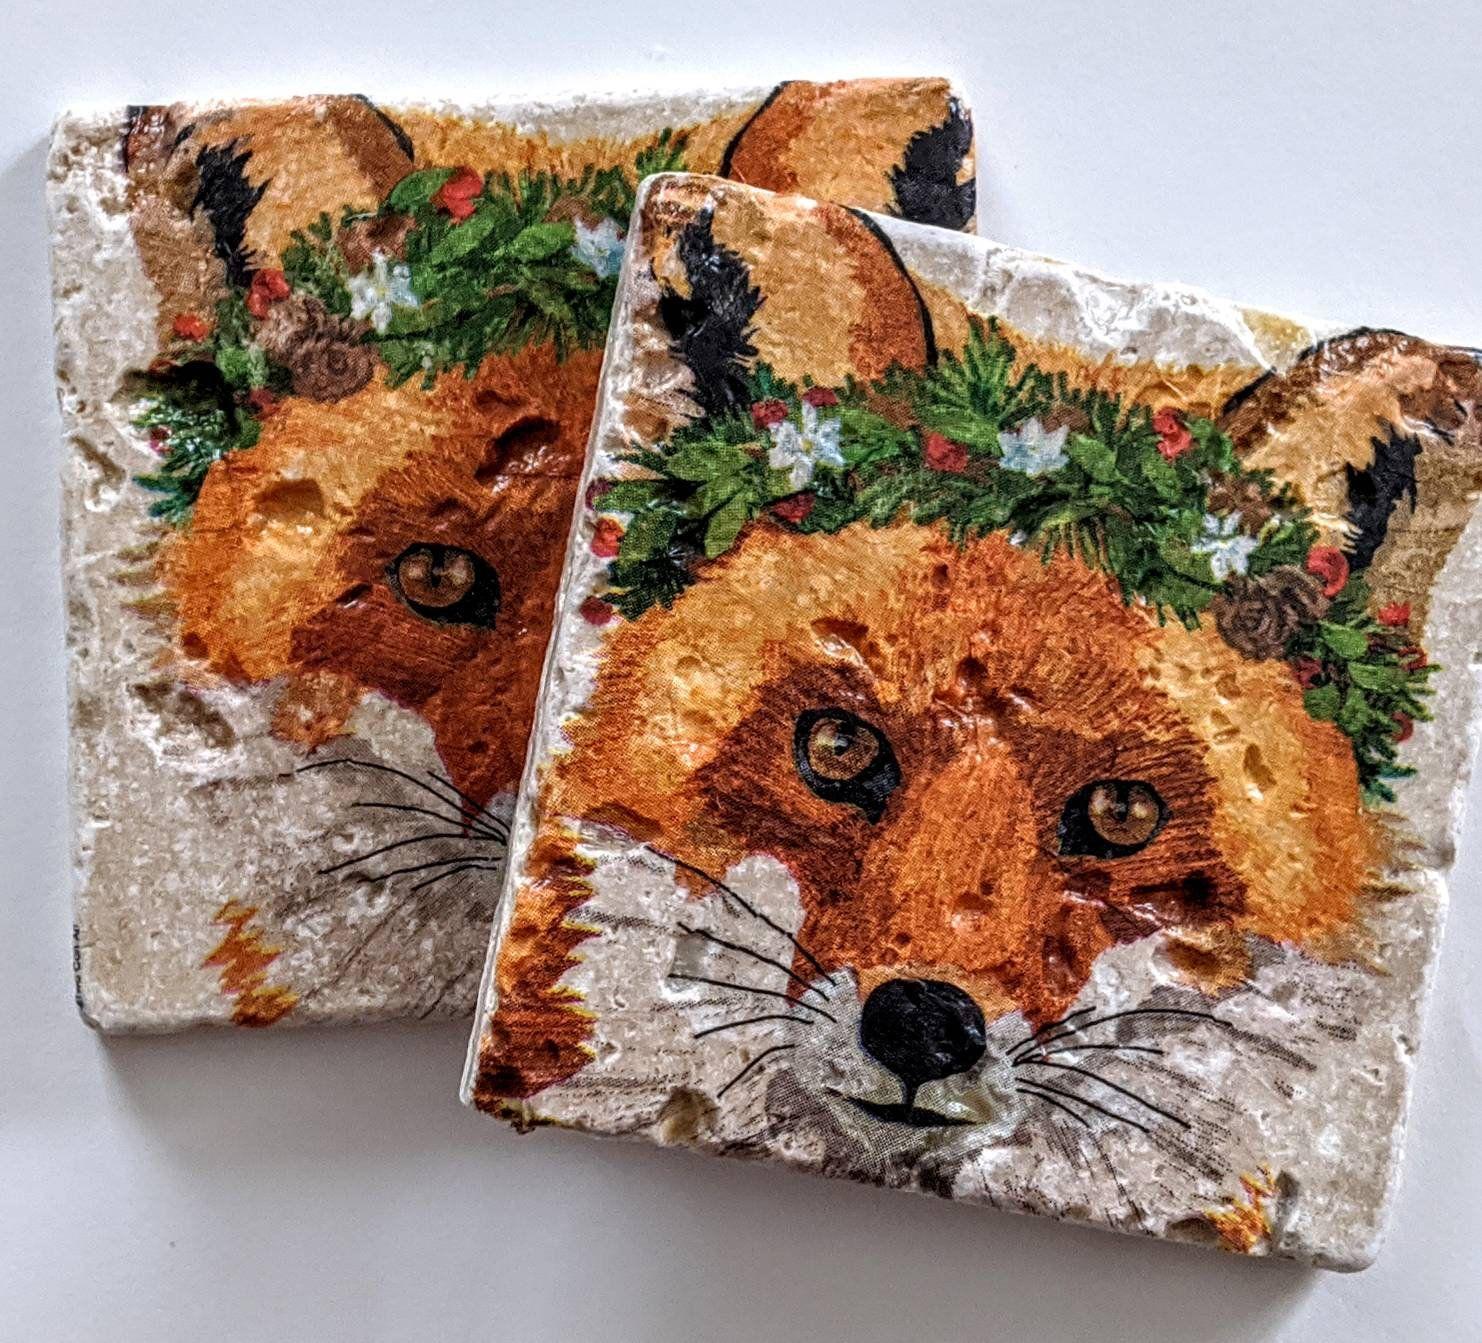 Cute red fox stone art drink coaster rustic home decor